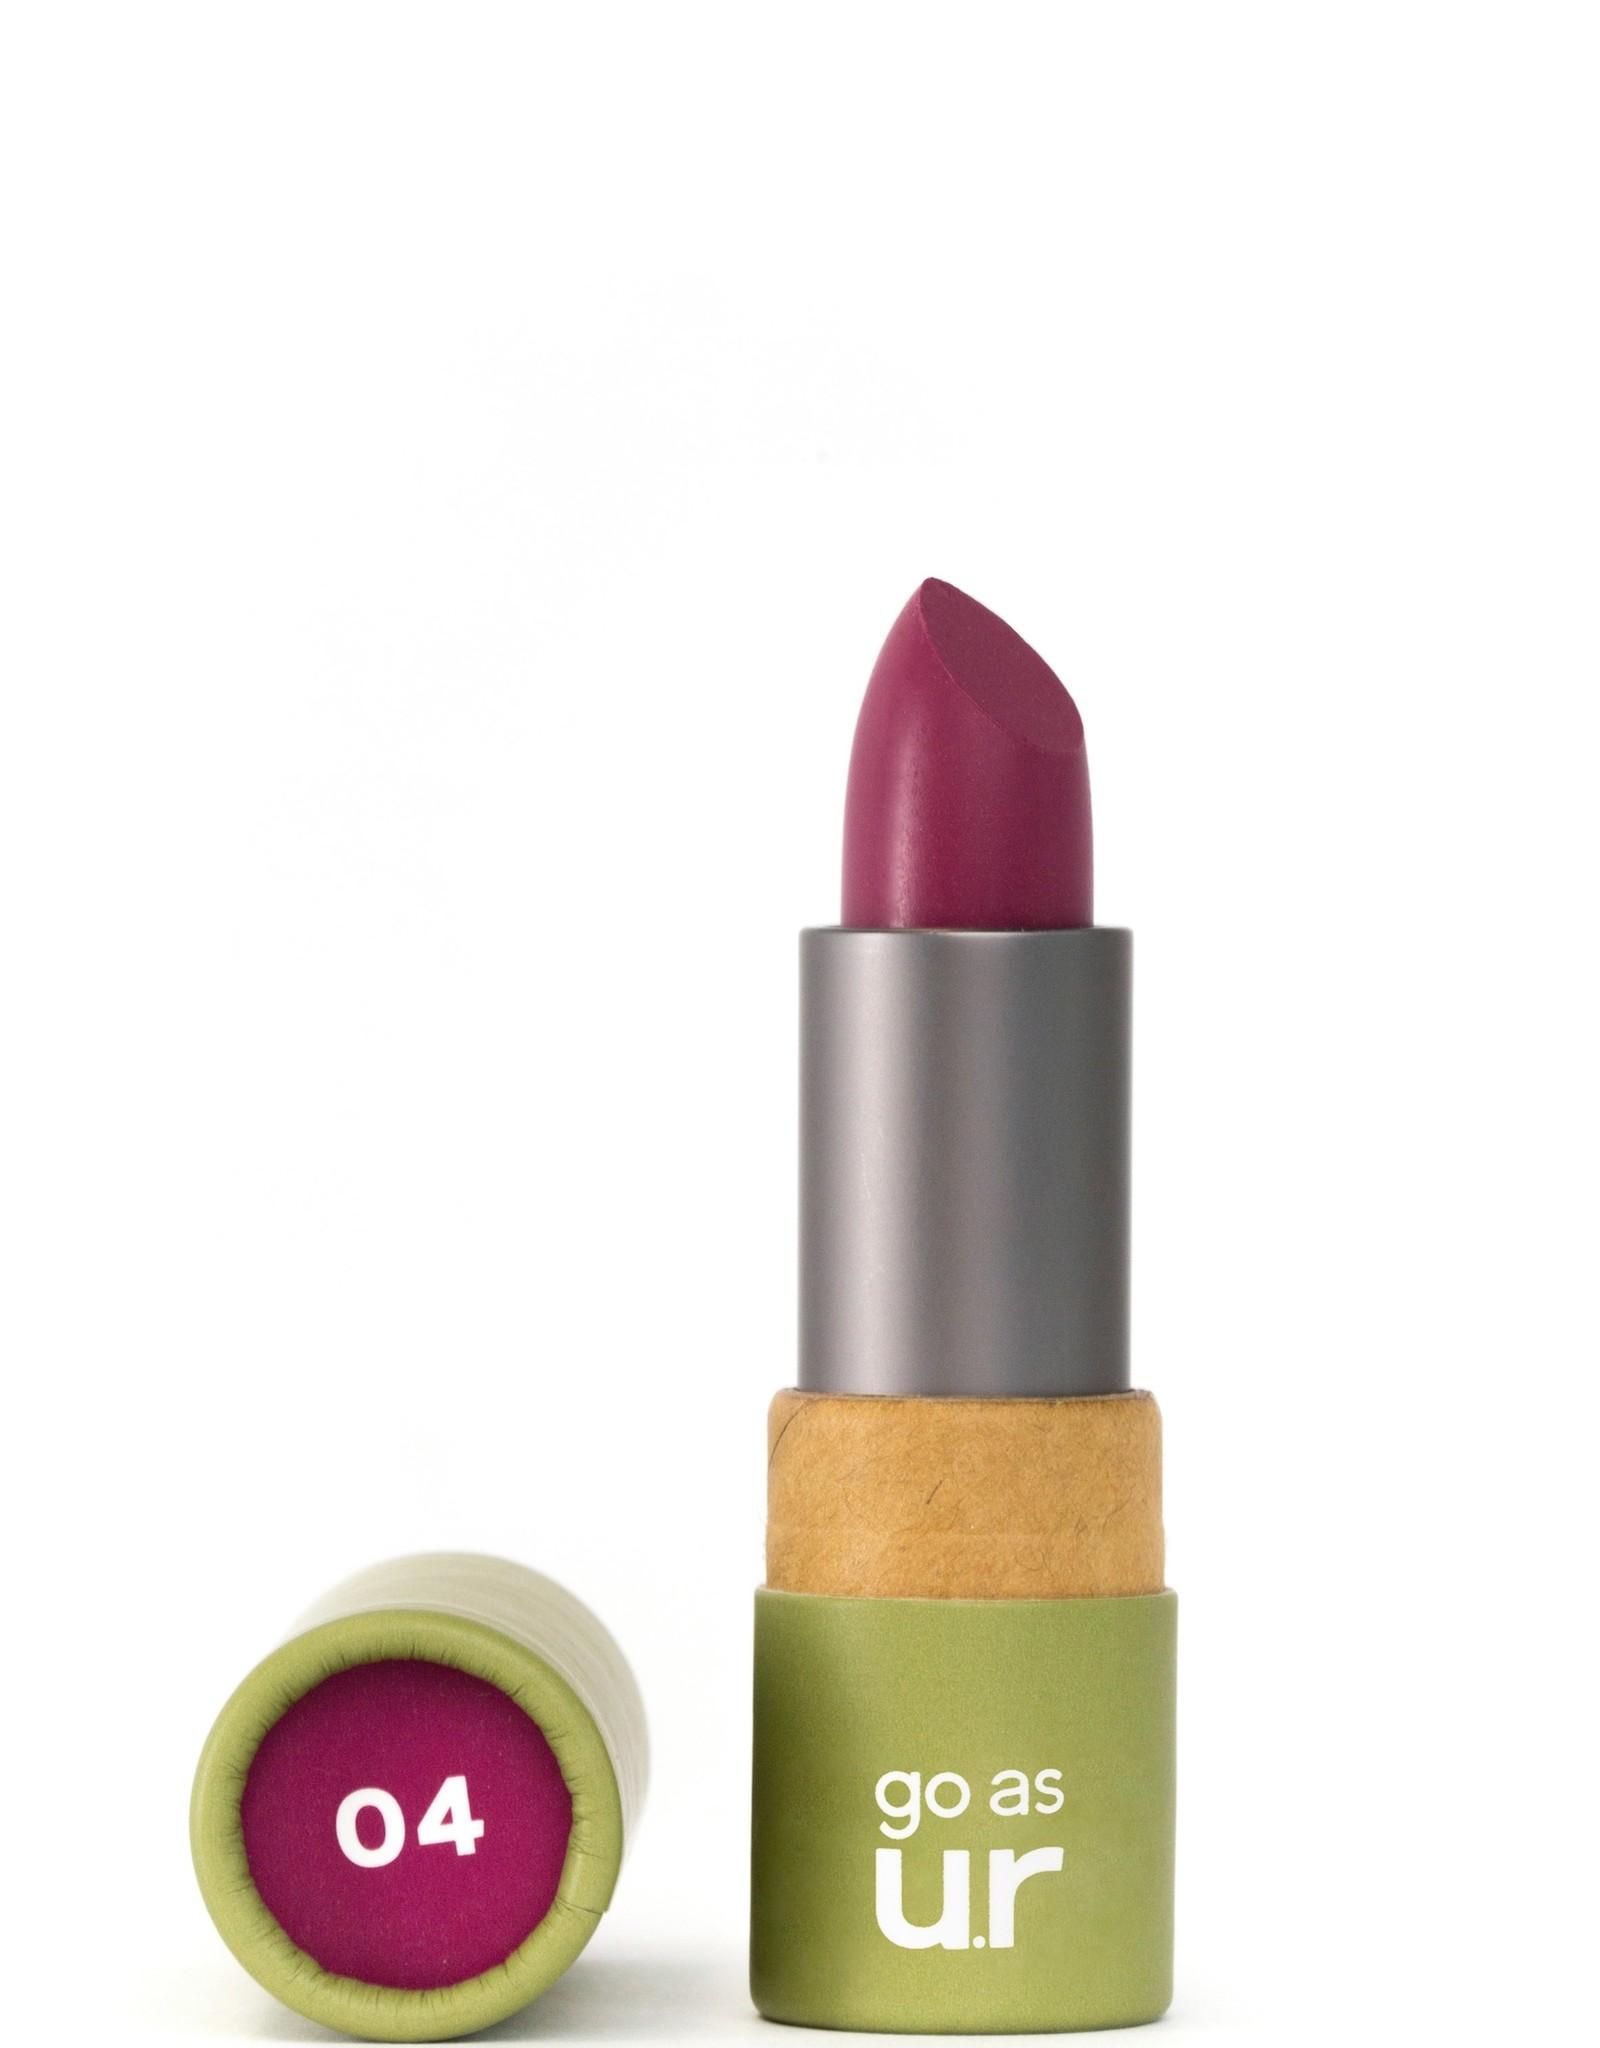 Go as ur Vegan Lipstick Deep Fuchsia